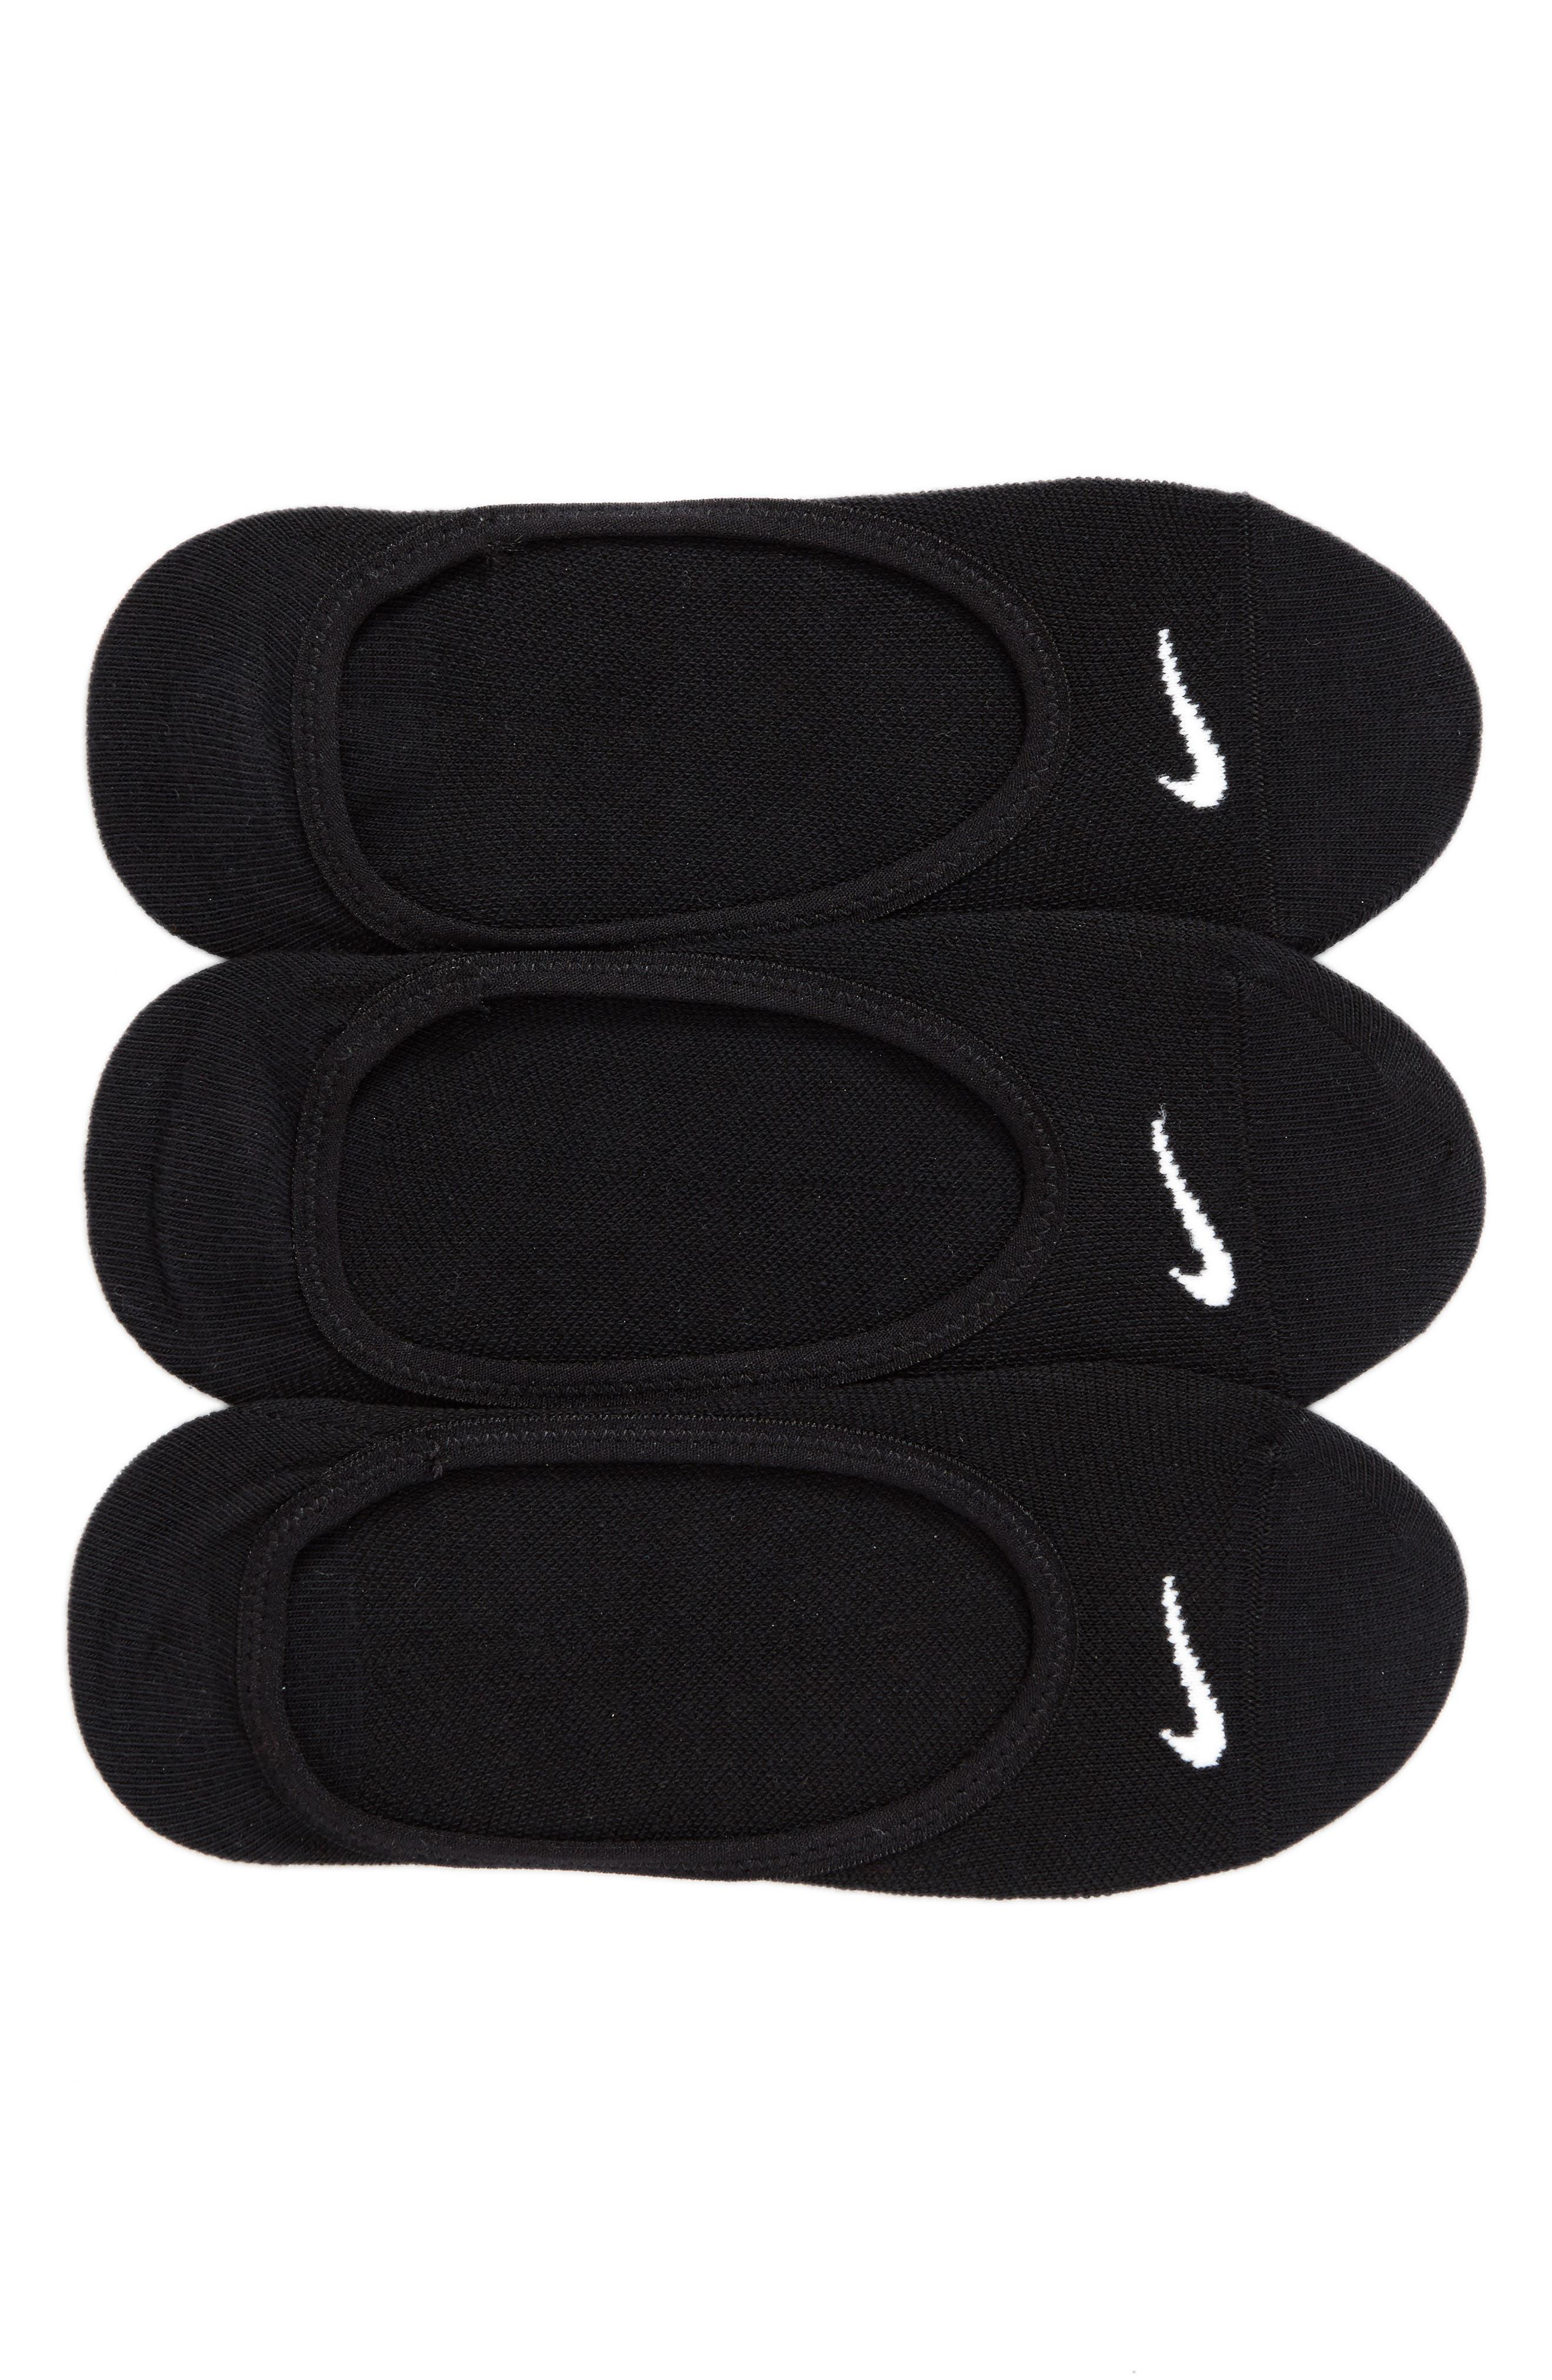 3-Pack No-Show Socks,                         Main,                         color, Black/(White)